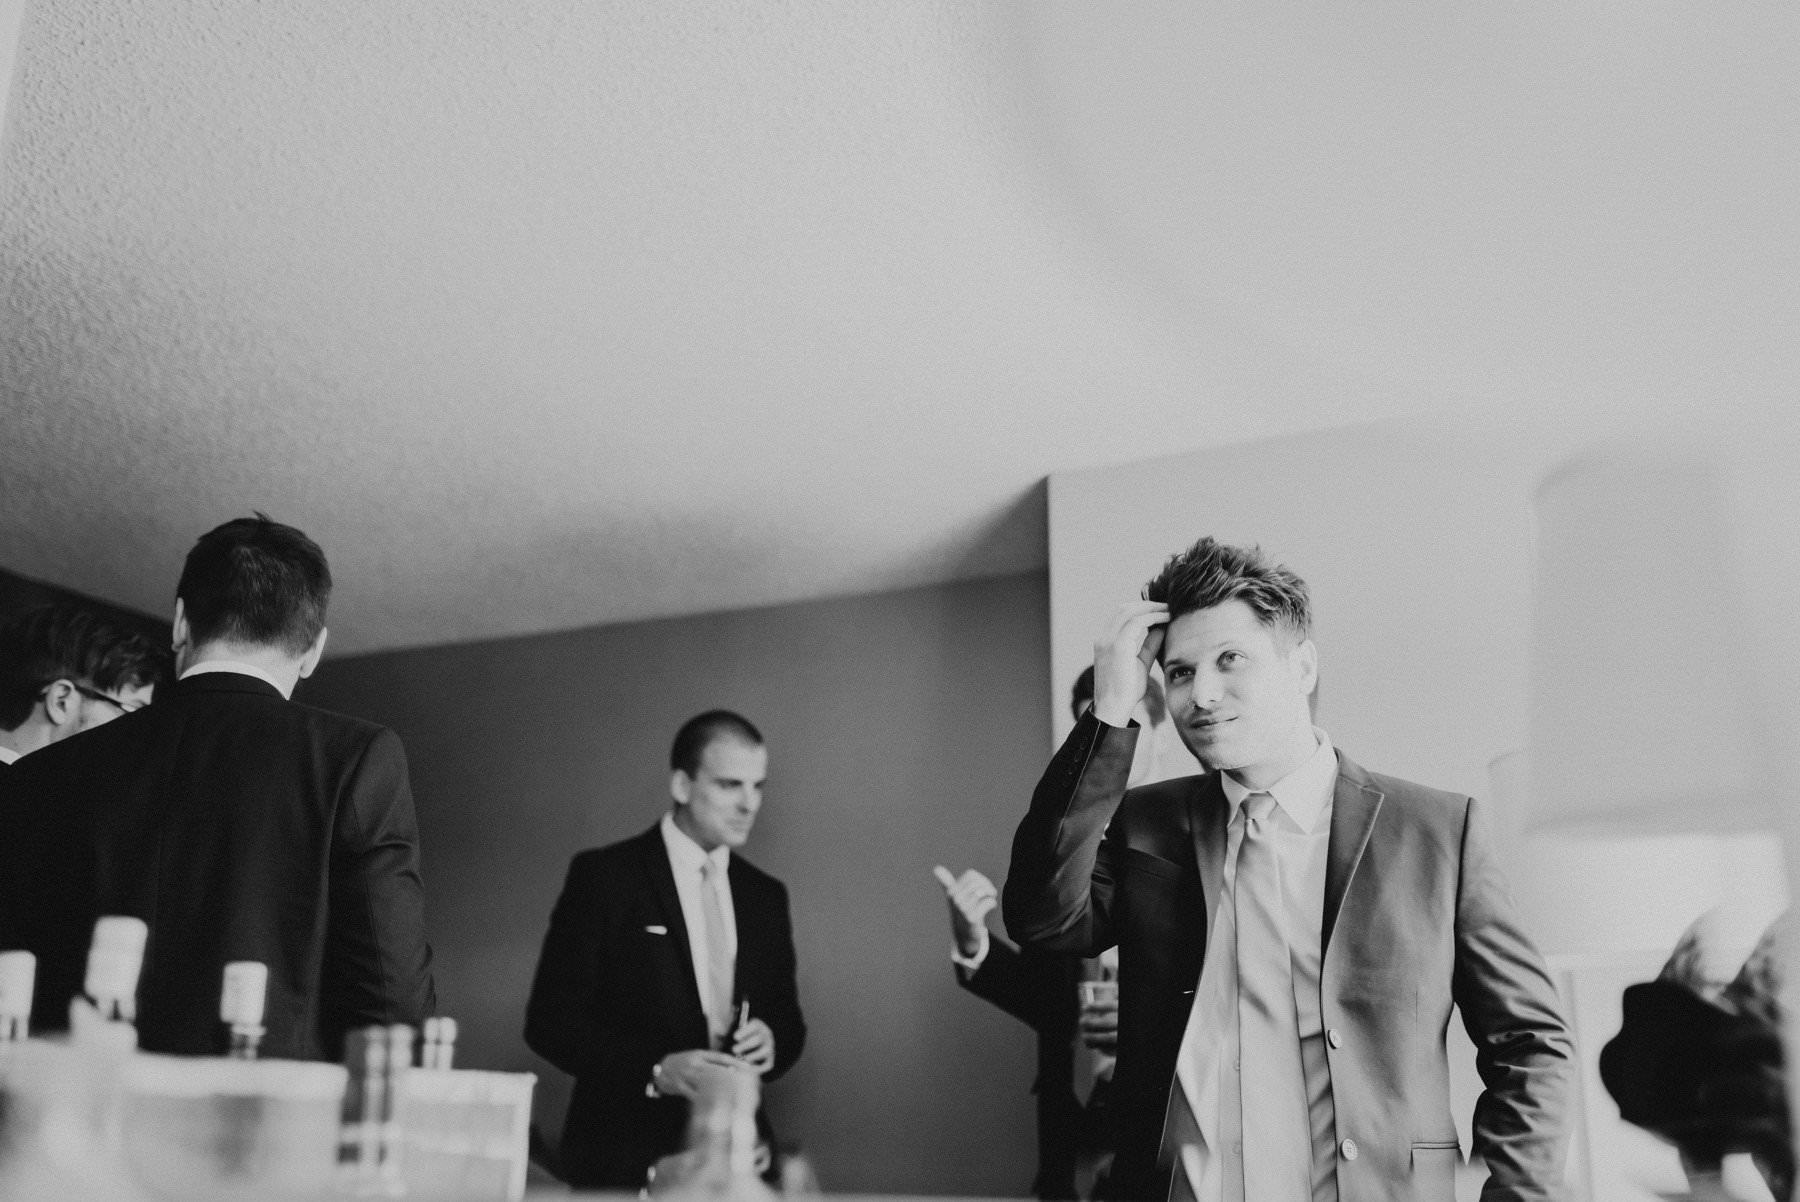 Appleford-estate-wedding-10.jpg